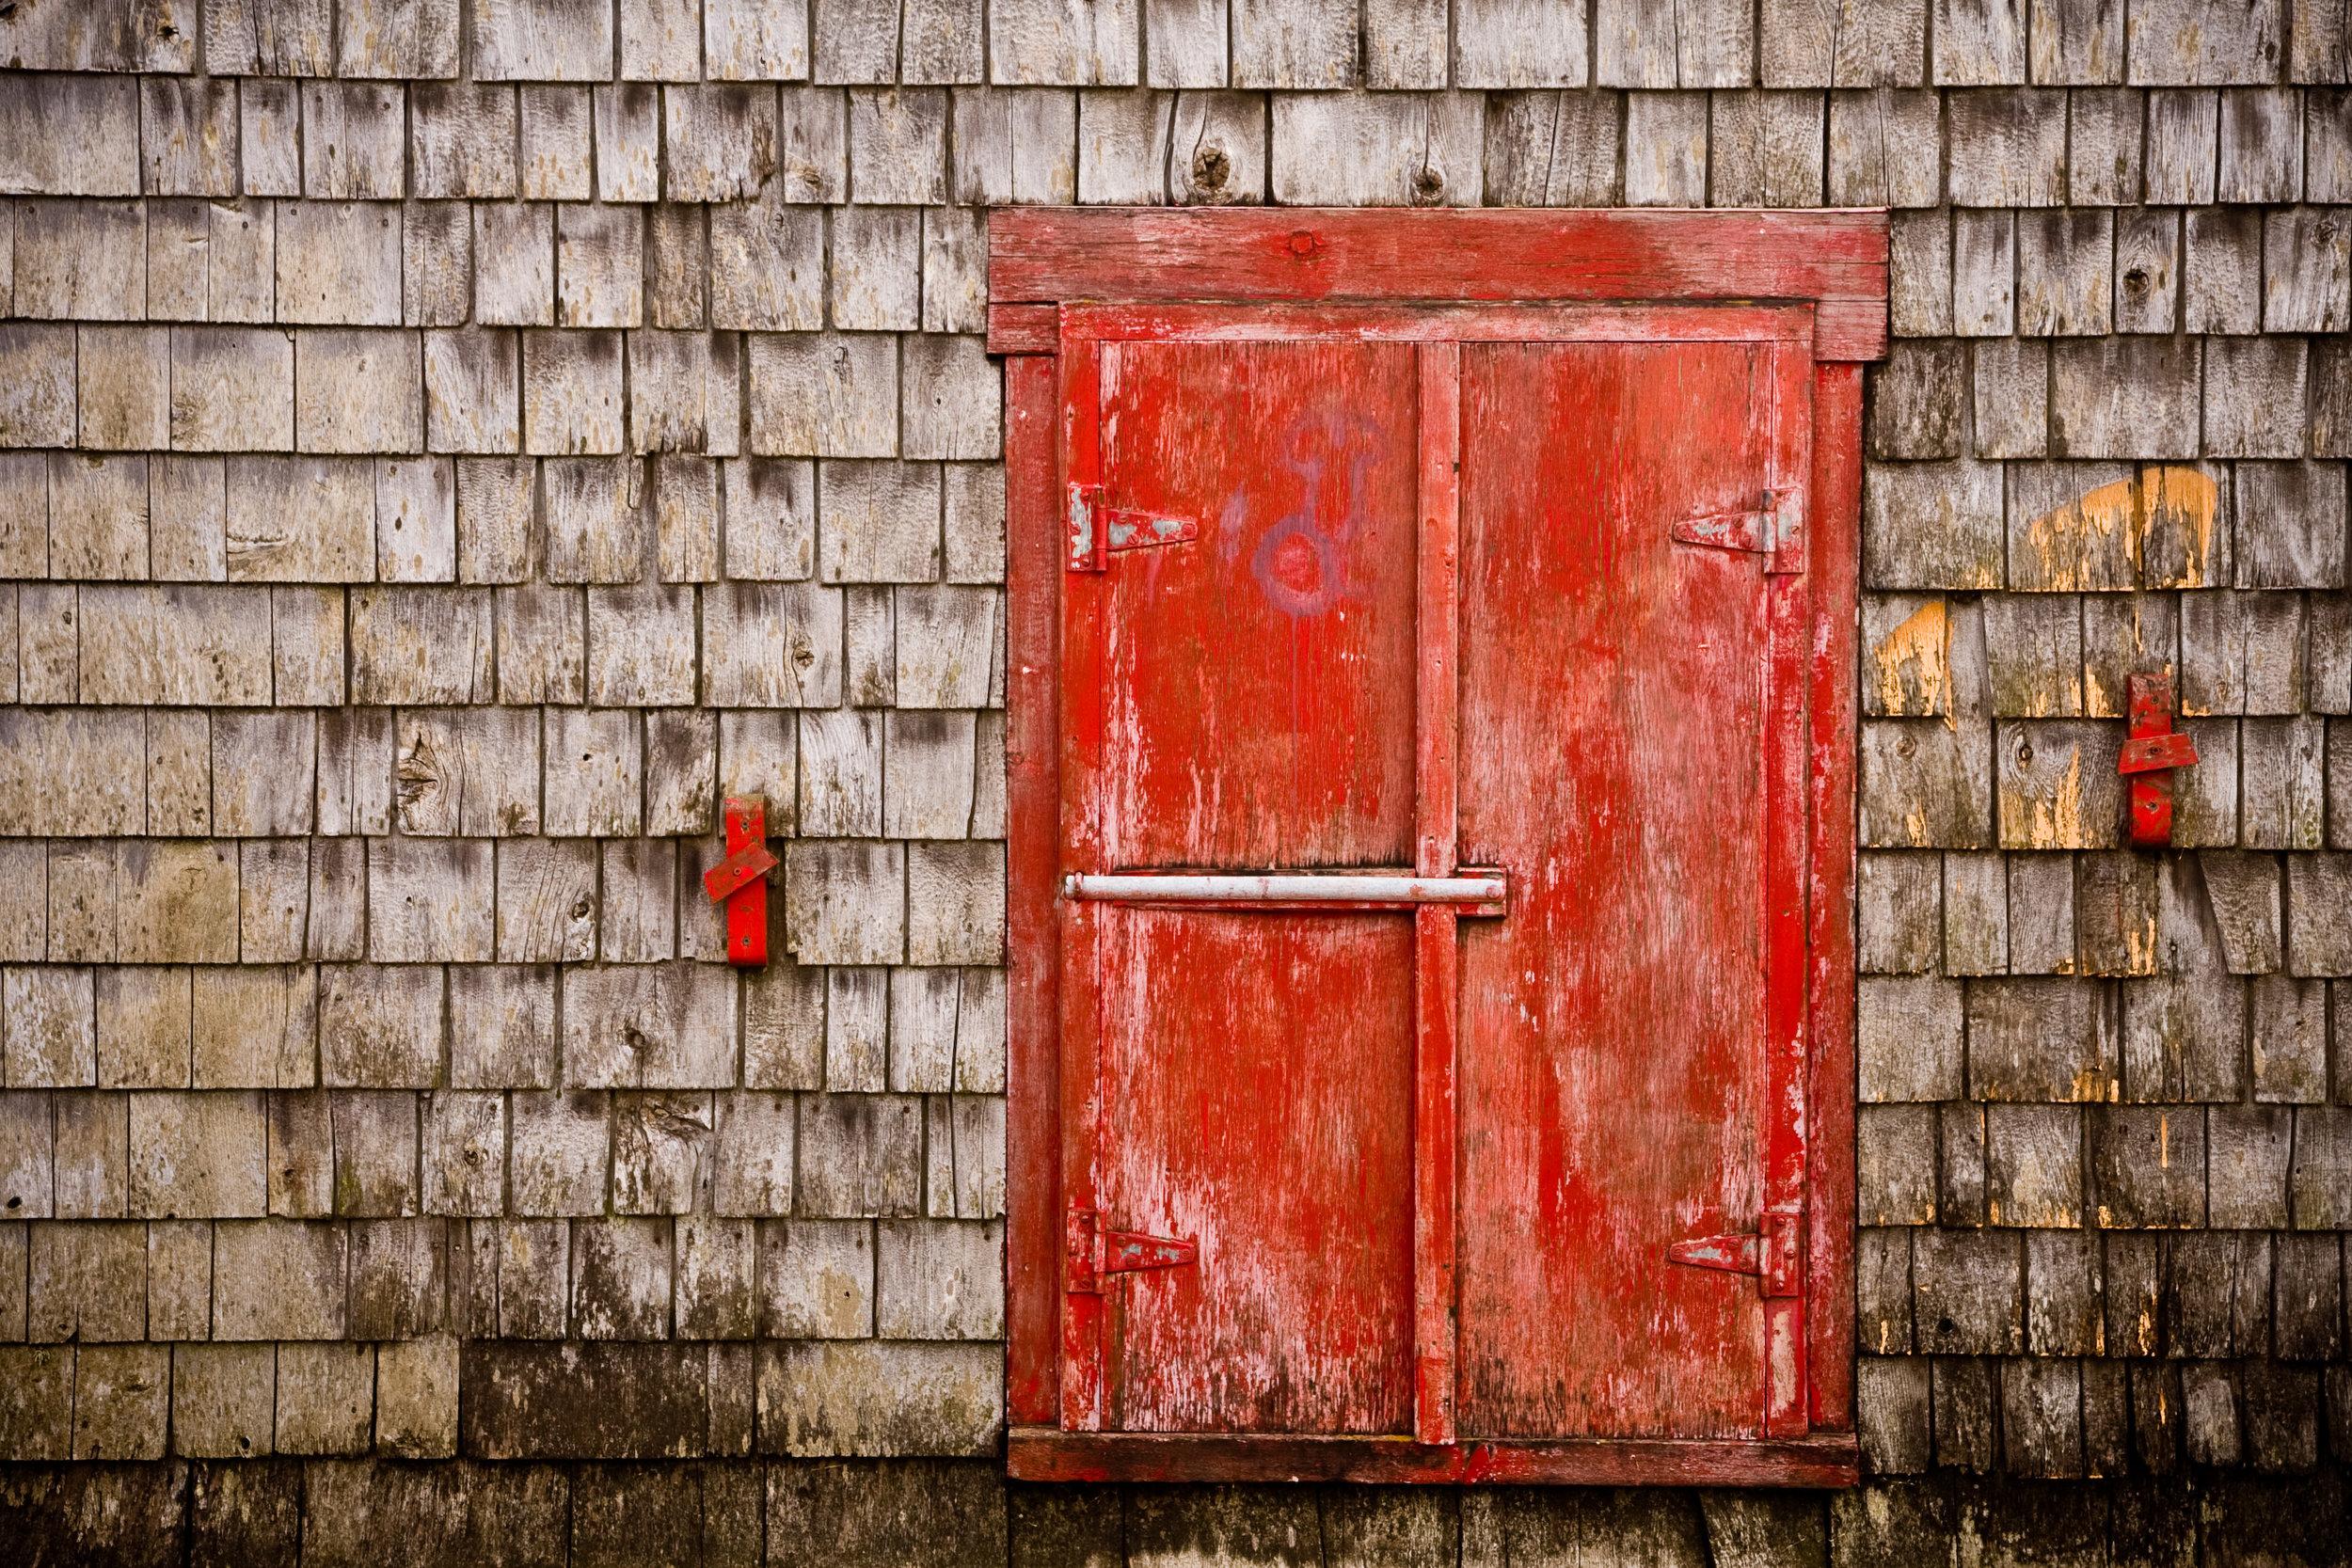 Shed Door, Seal Cove